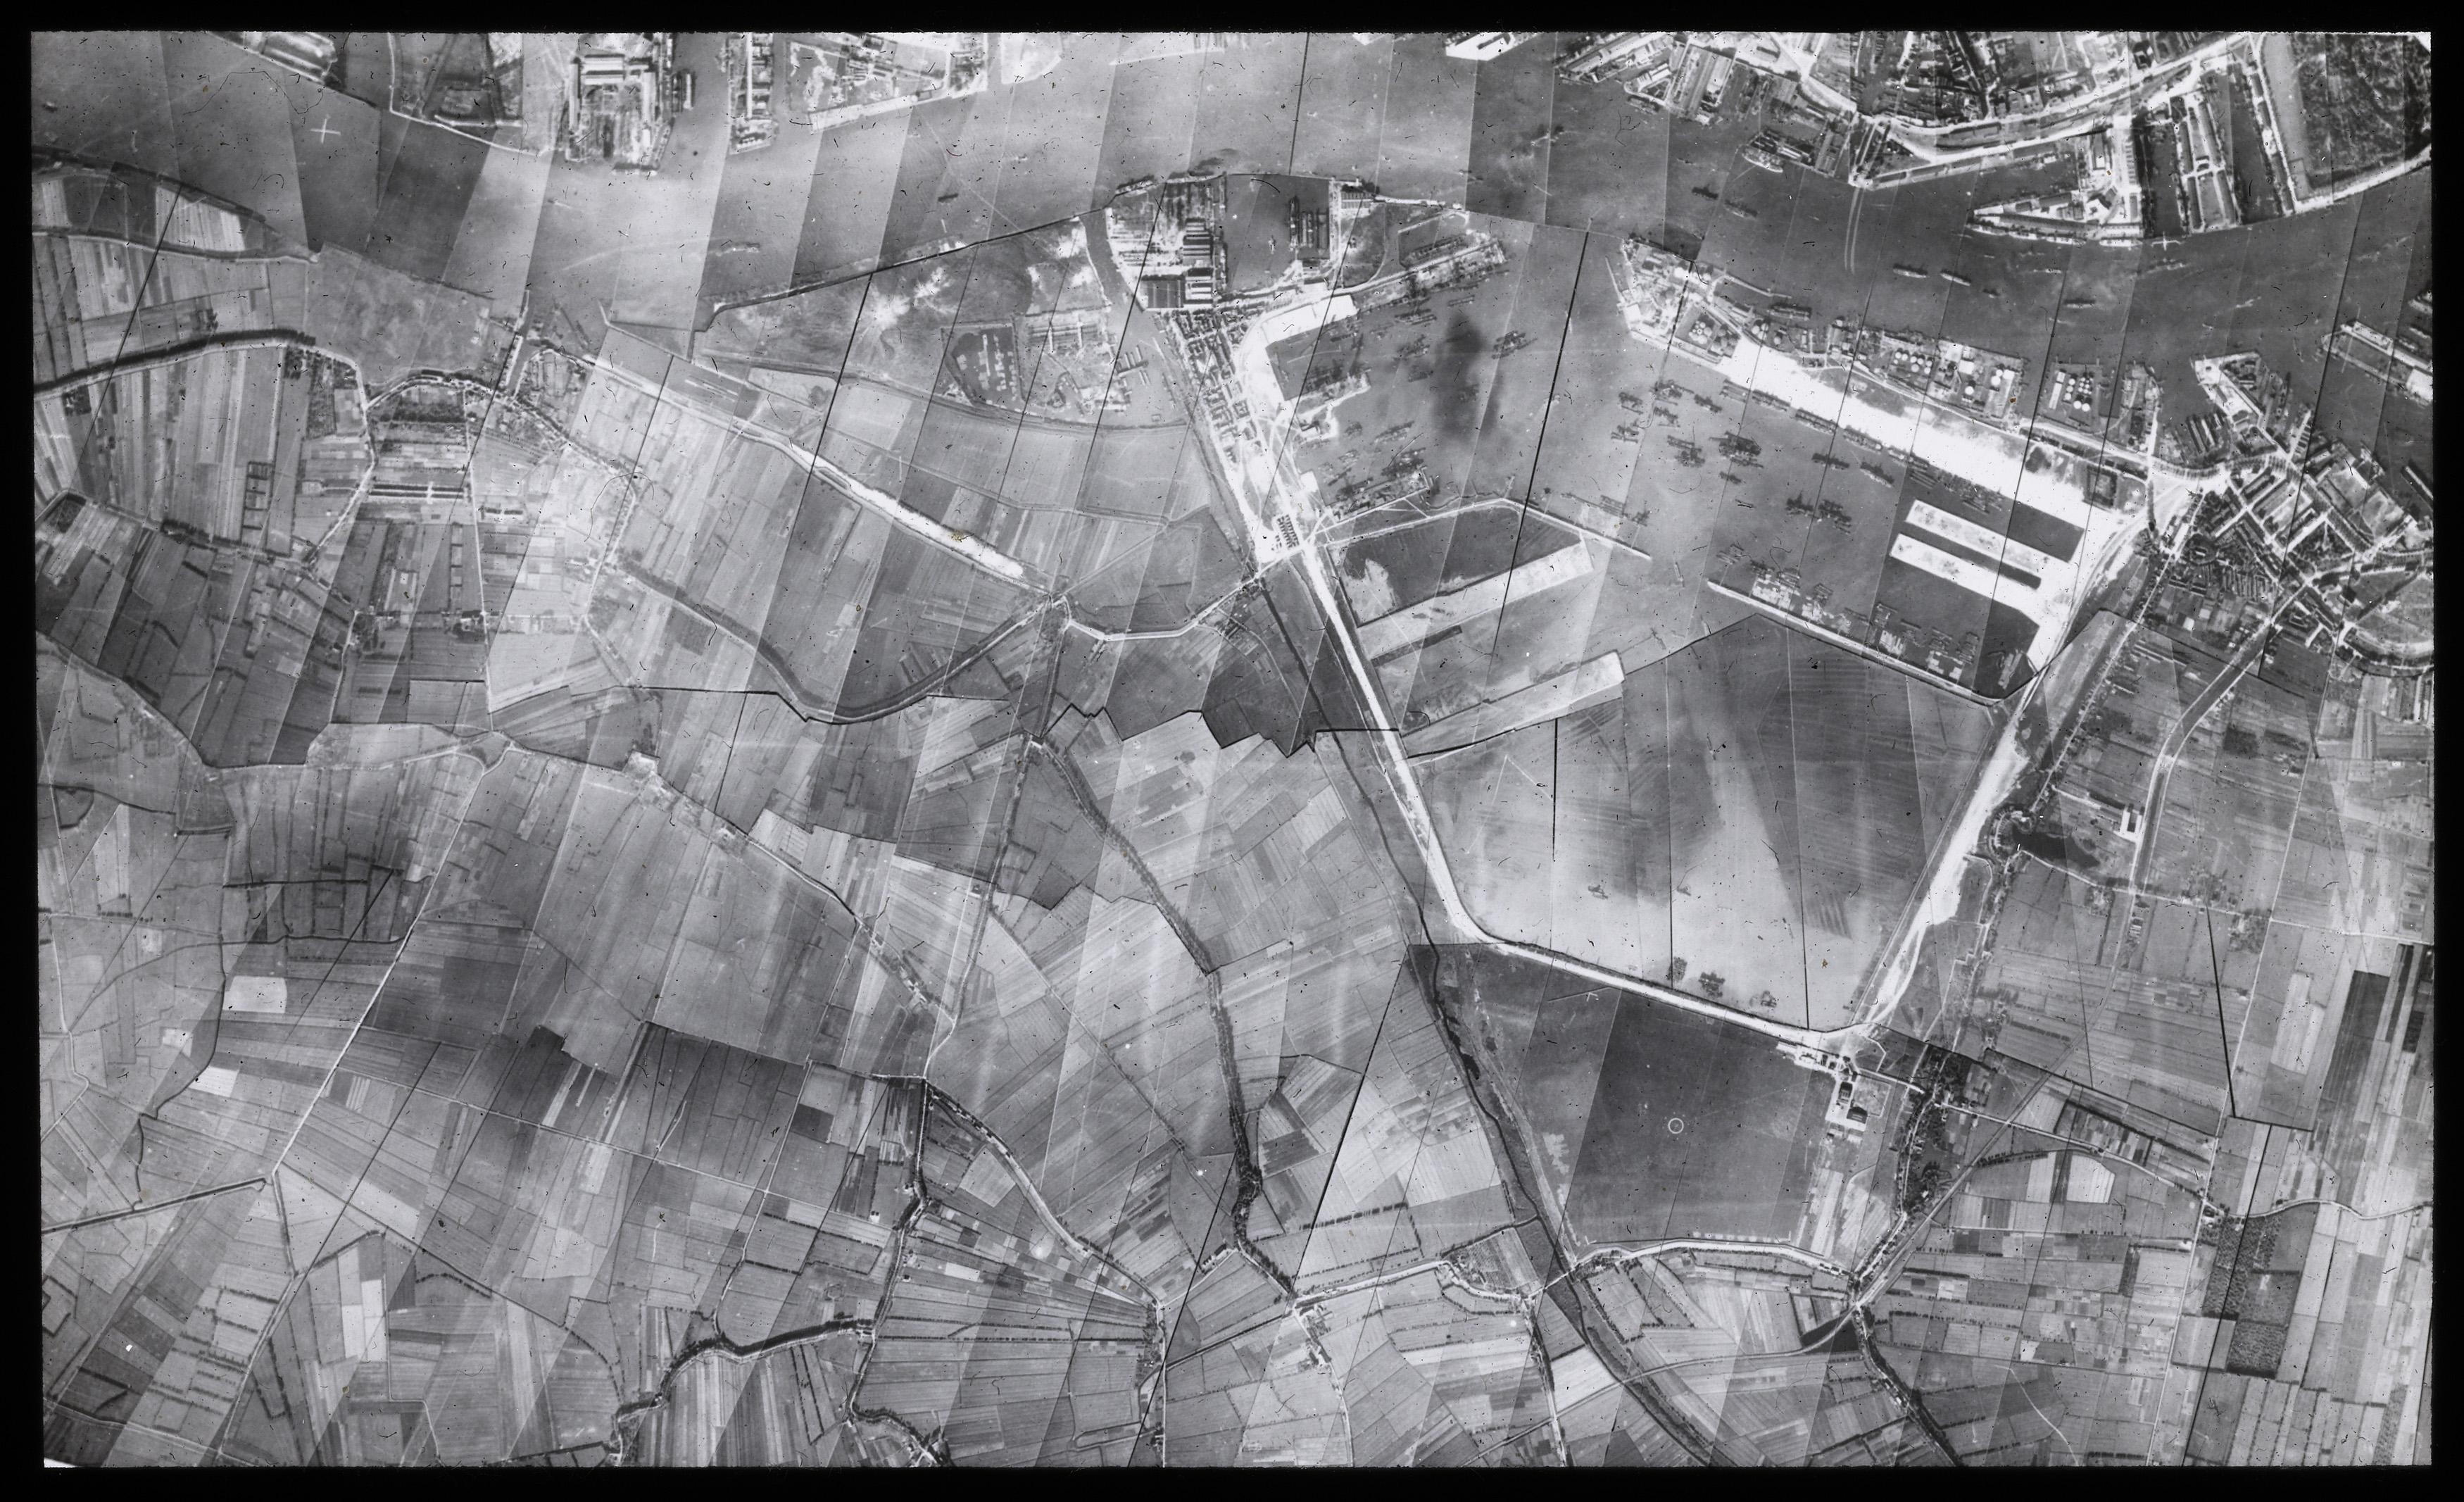 NIMH_-_2011_-_3652_-_Aerial_photograph_o